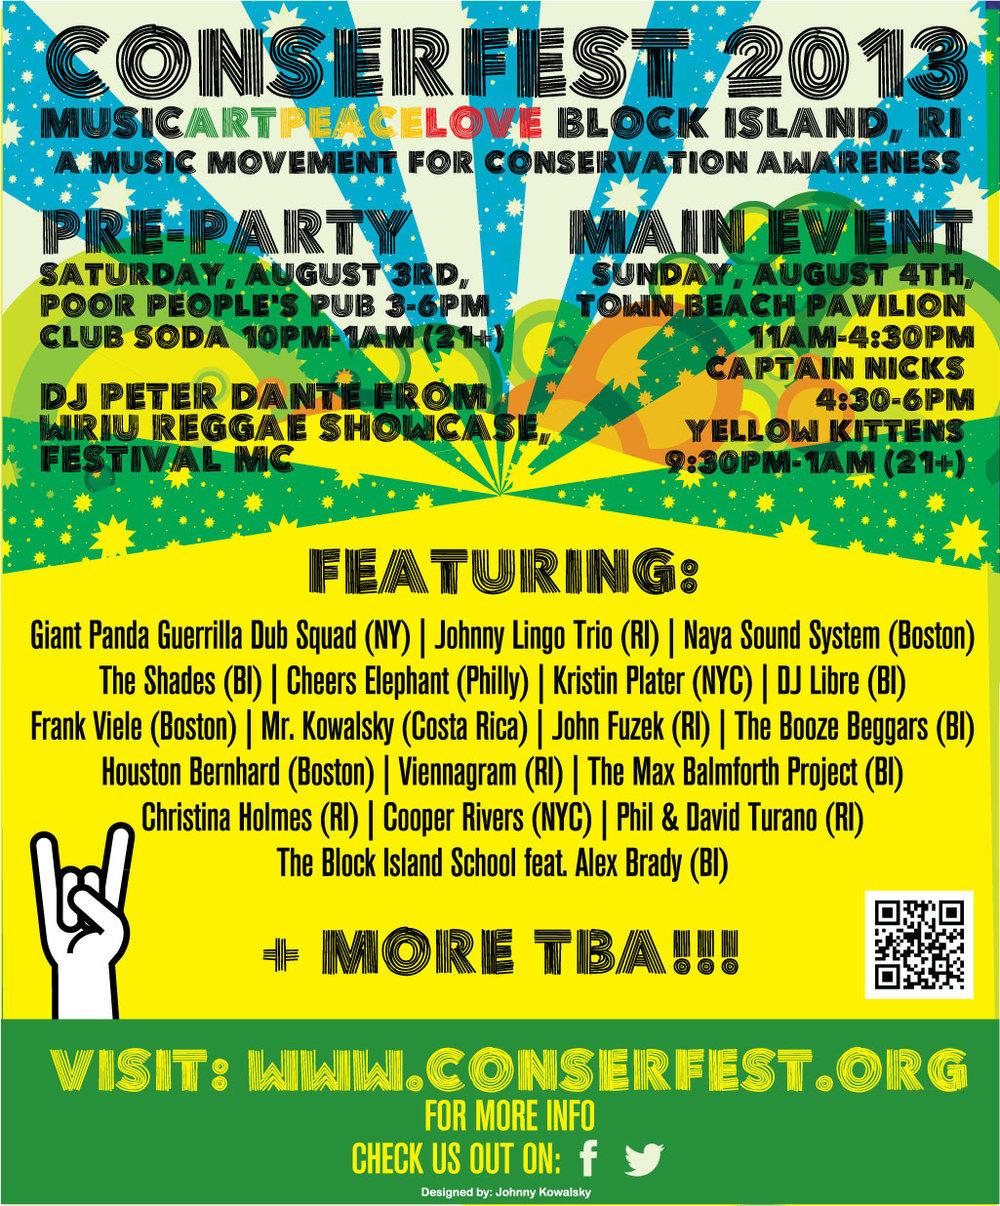 Consertfest_Flyer_2013_Final.jpg